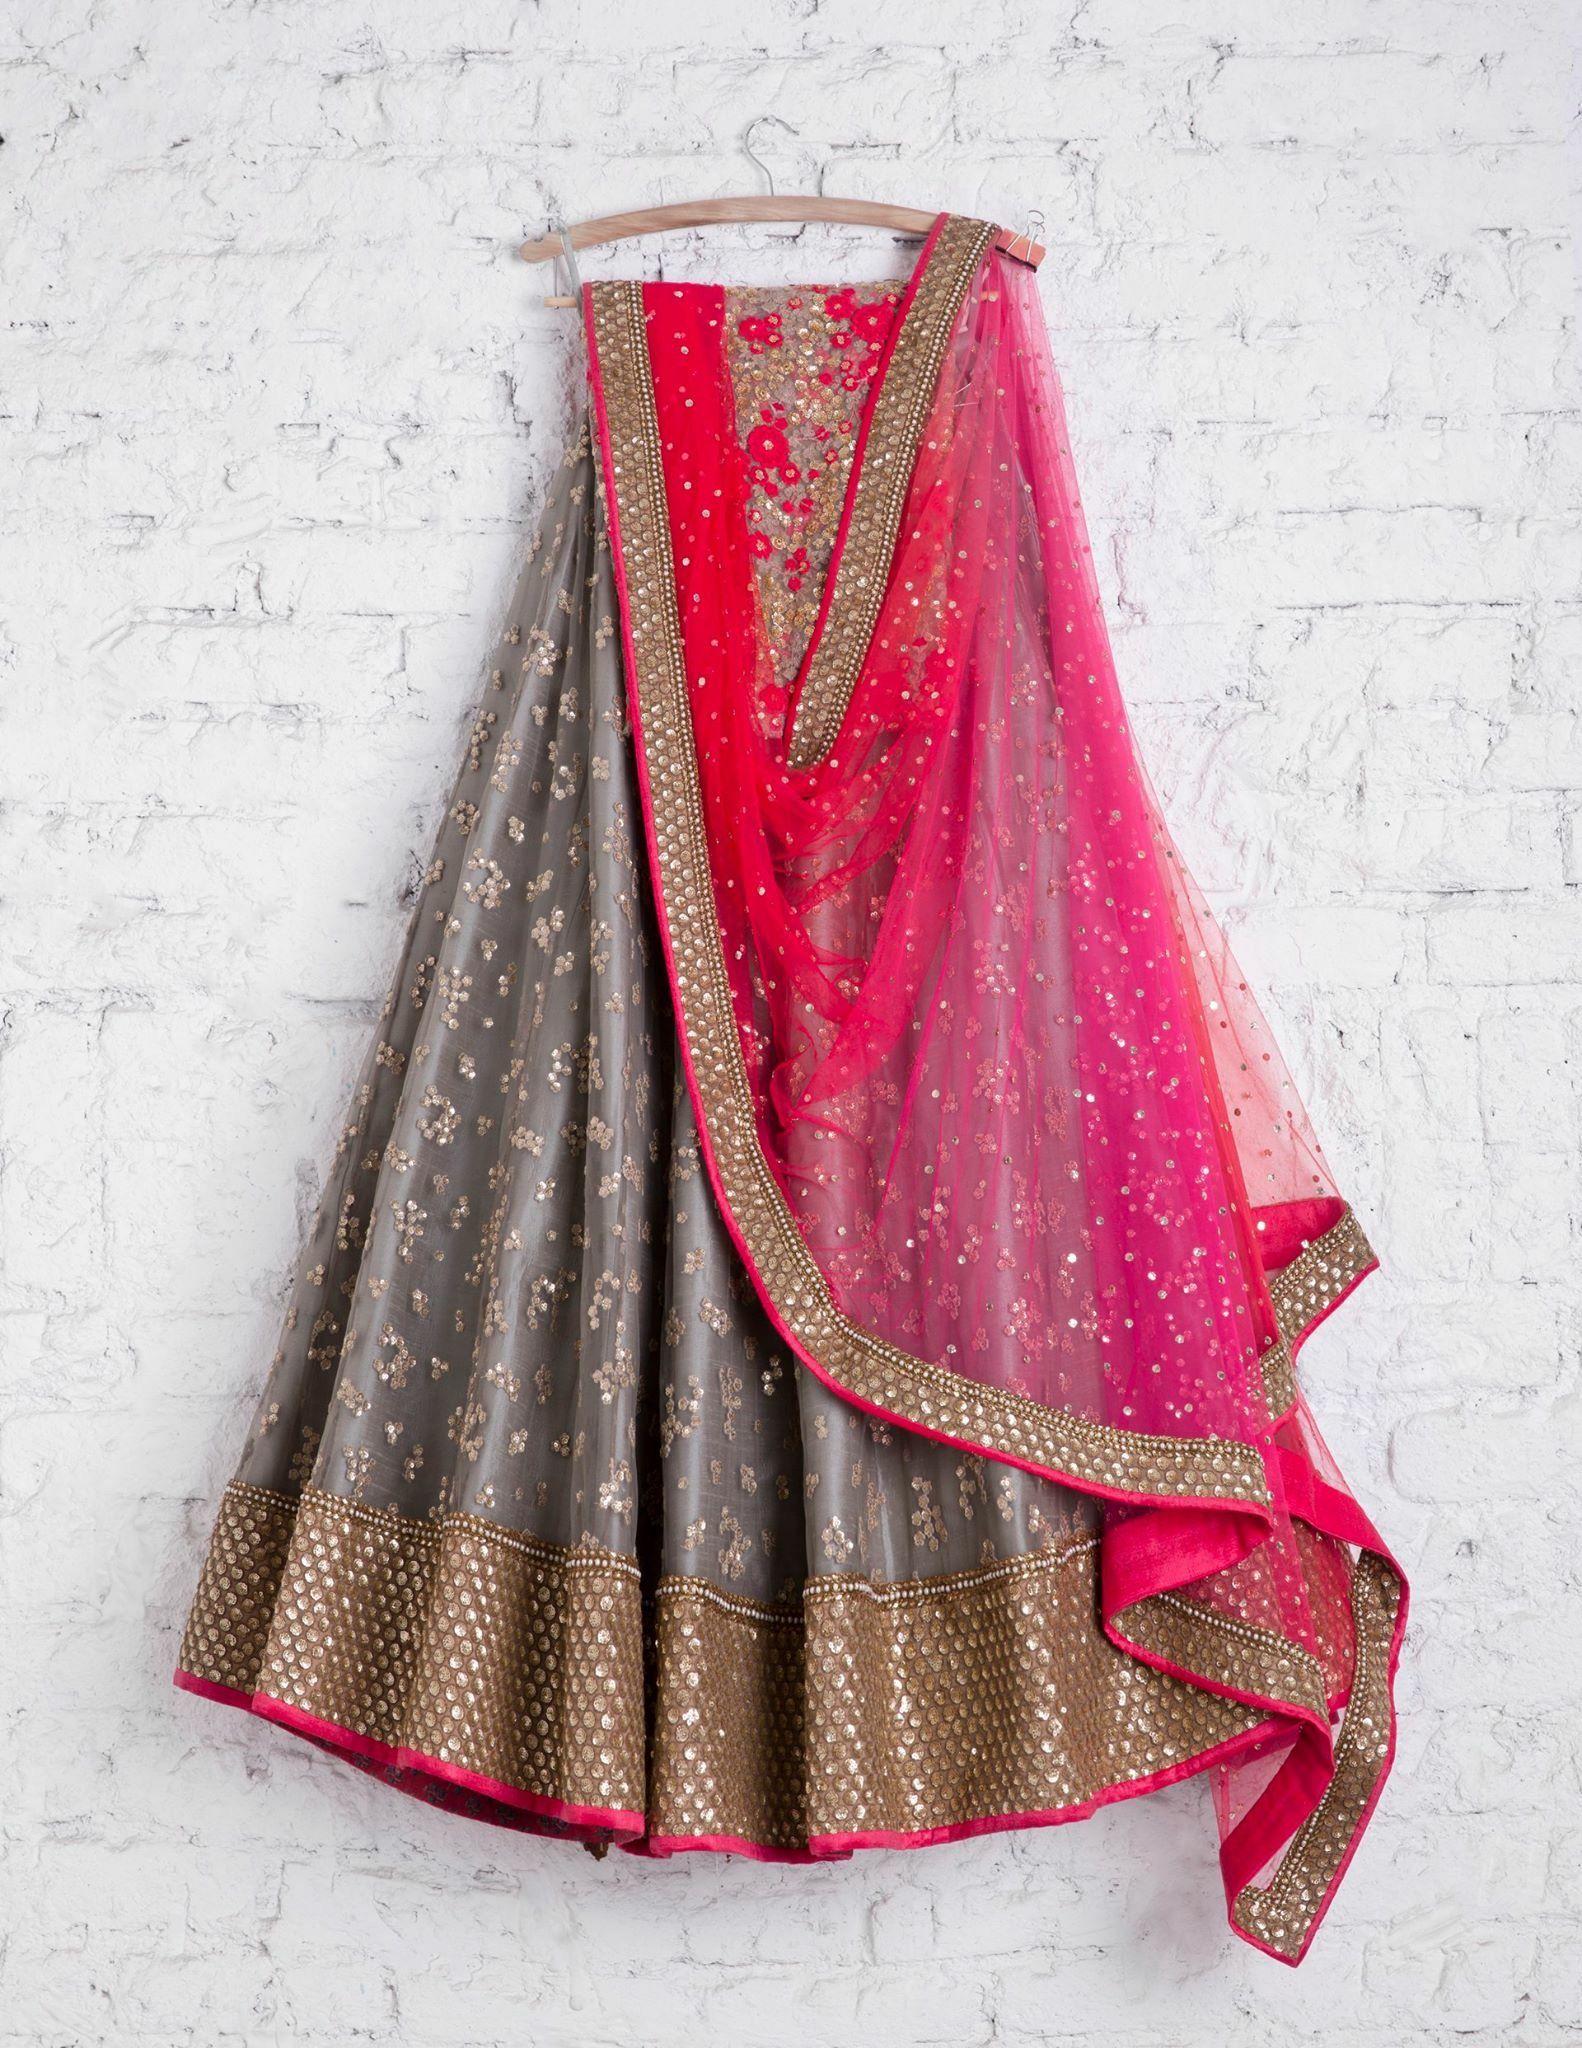 Pinterest ○ @bhavi91 | Hindú - Bollywood - Indian - Sari - Lehenga ...